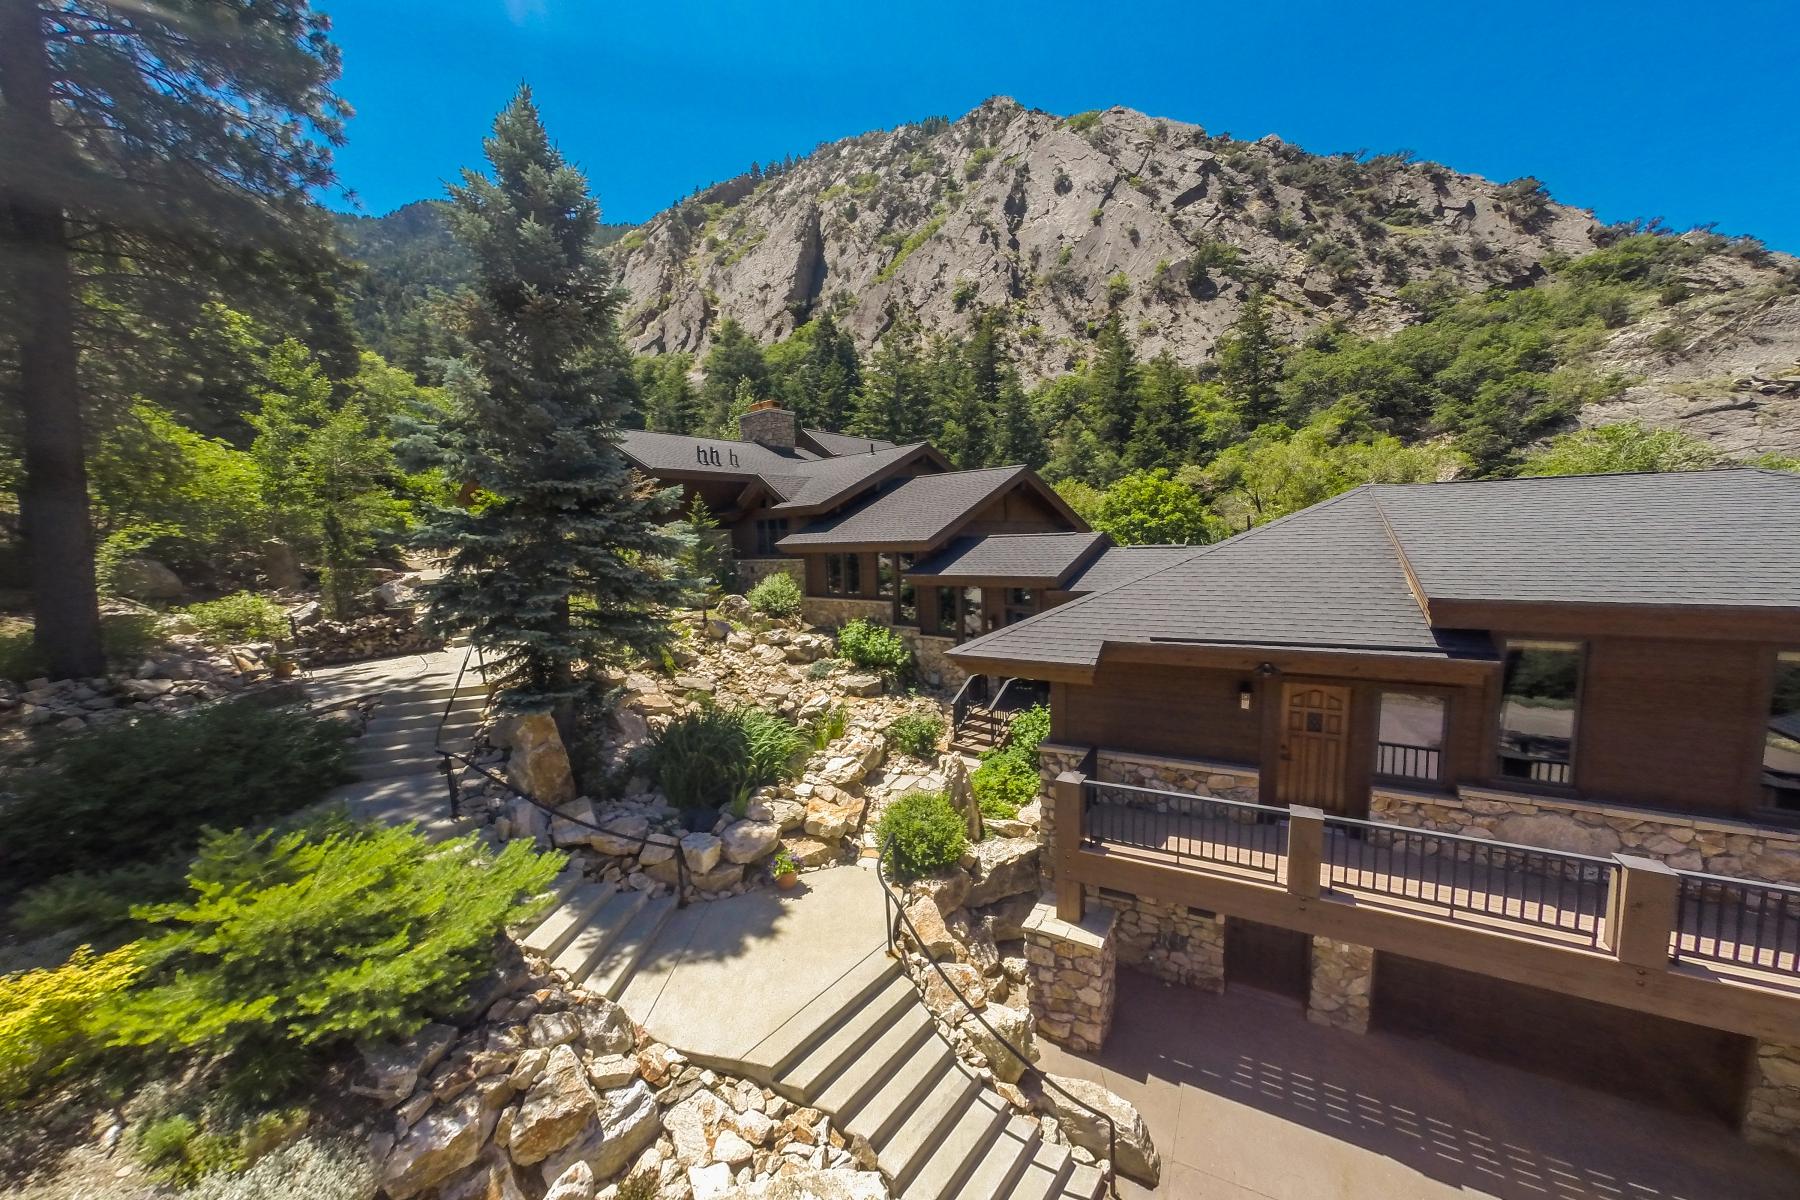 Edgecliff Mountain Retreat Ogden Canyon Utah